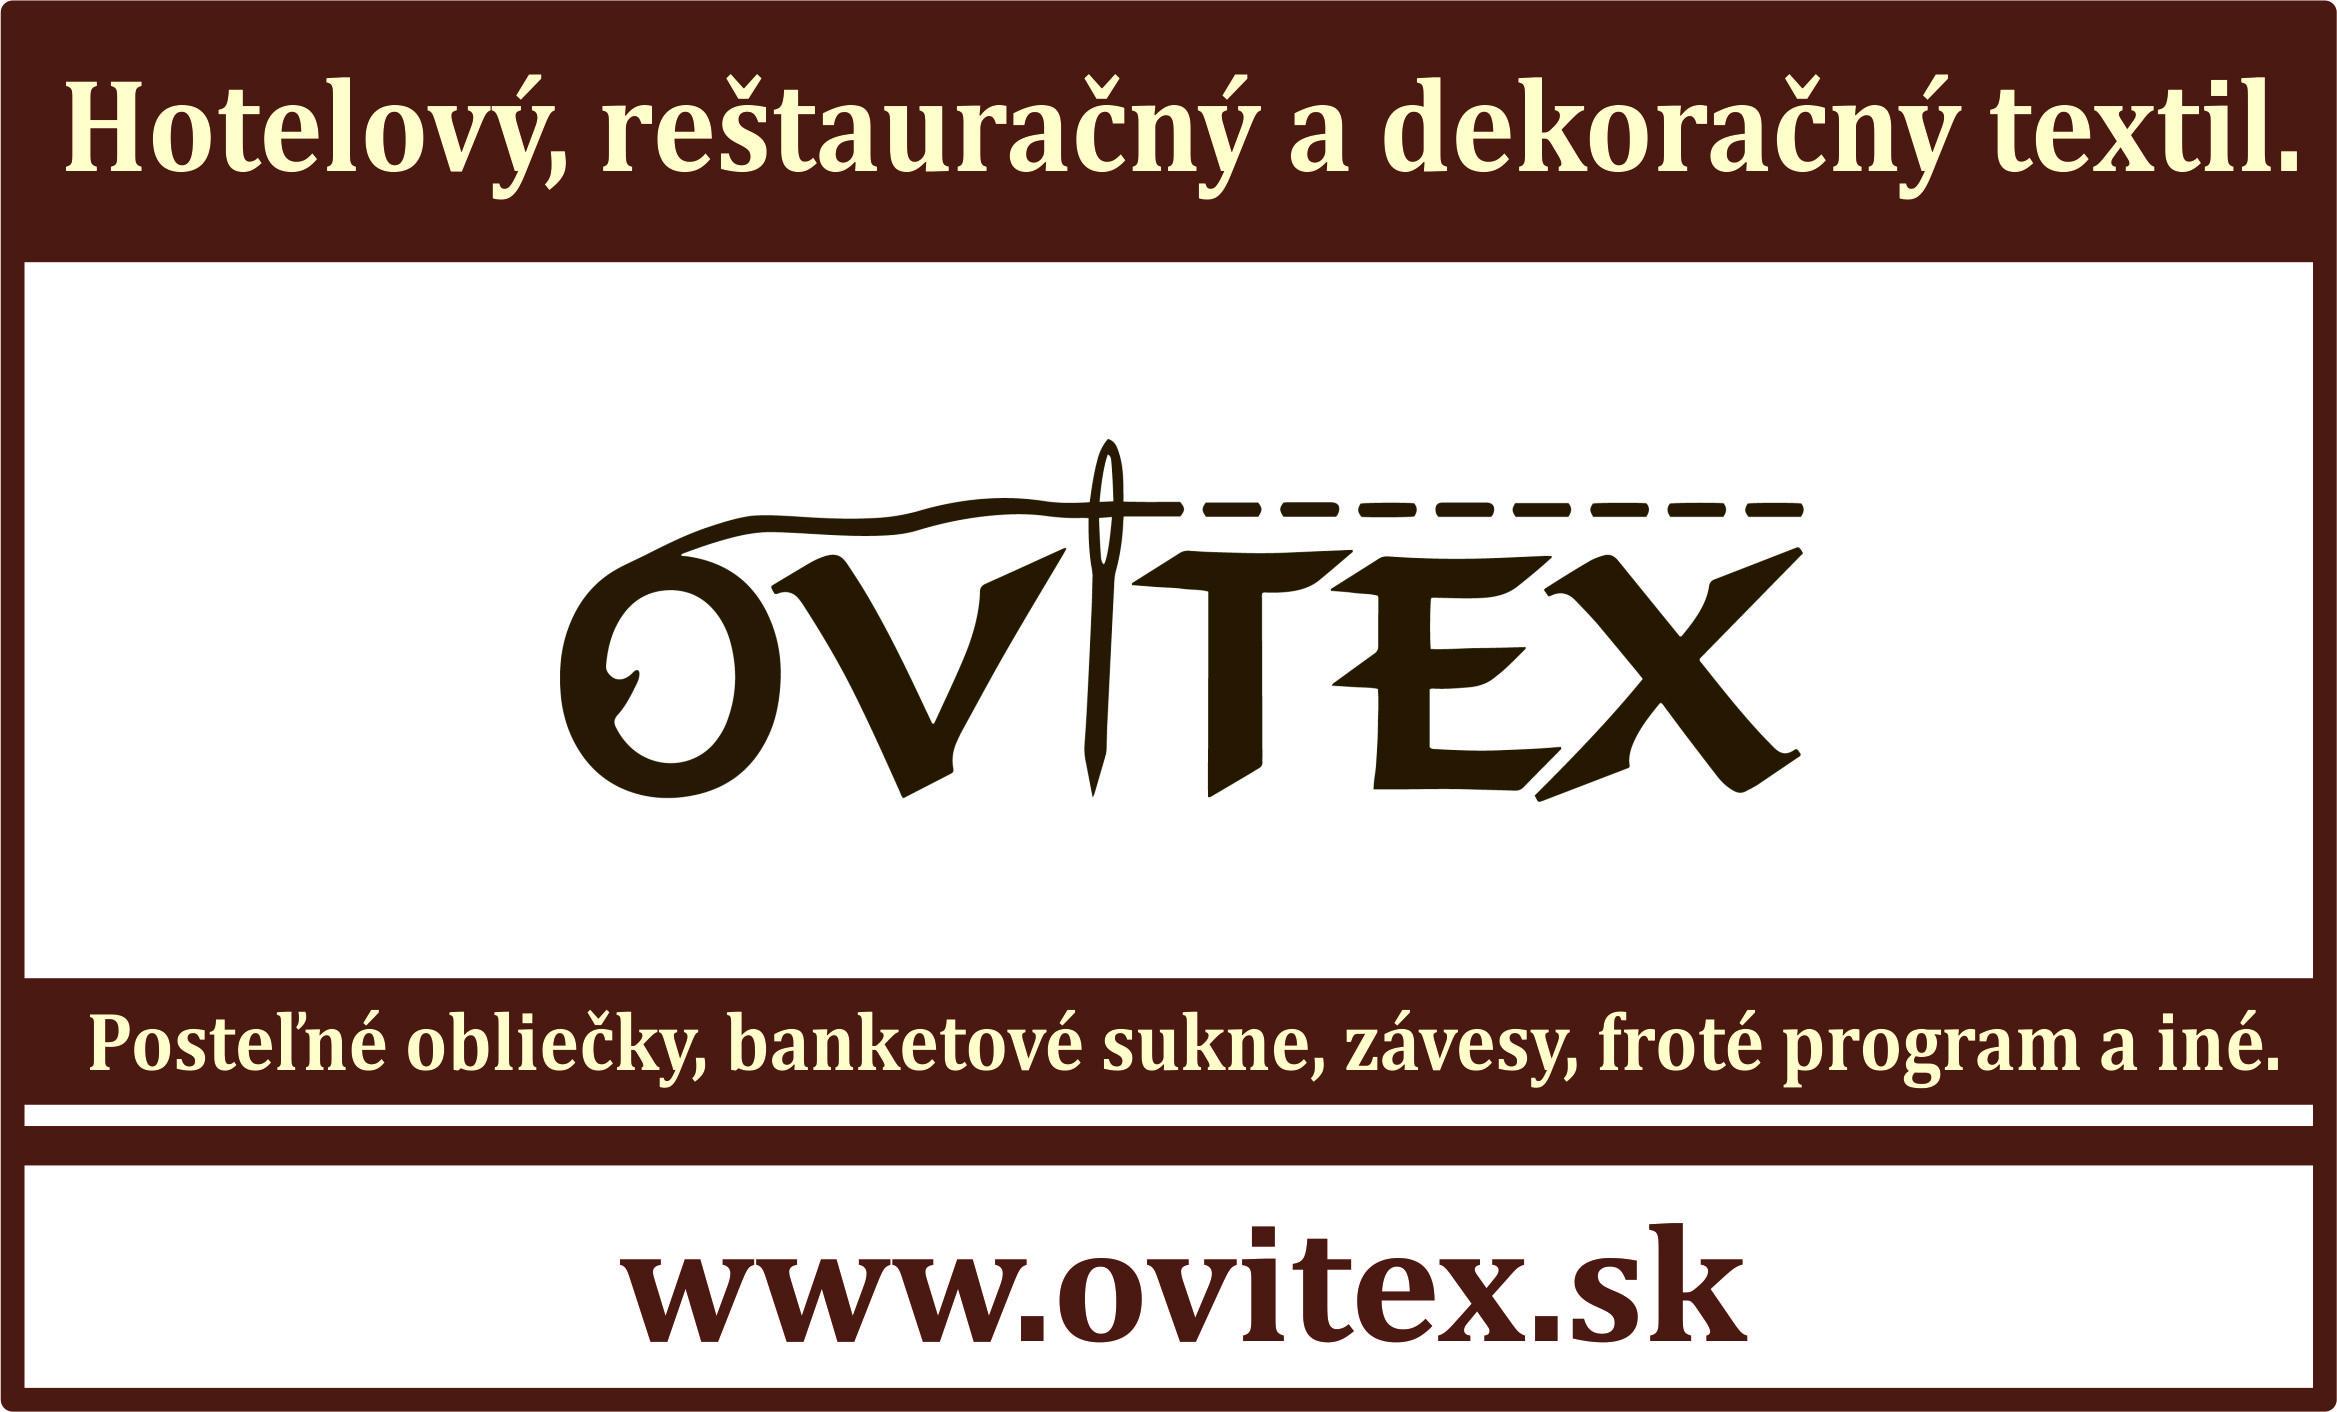 ovitex.sk